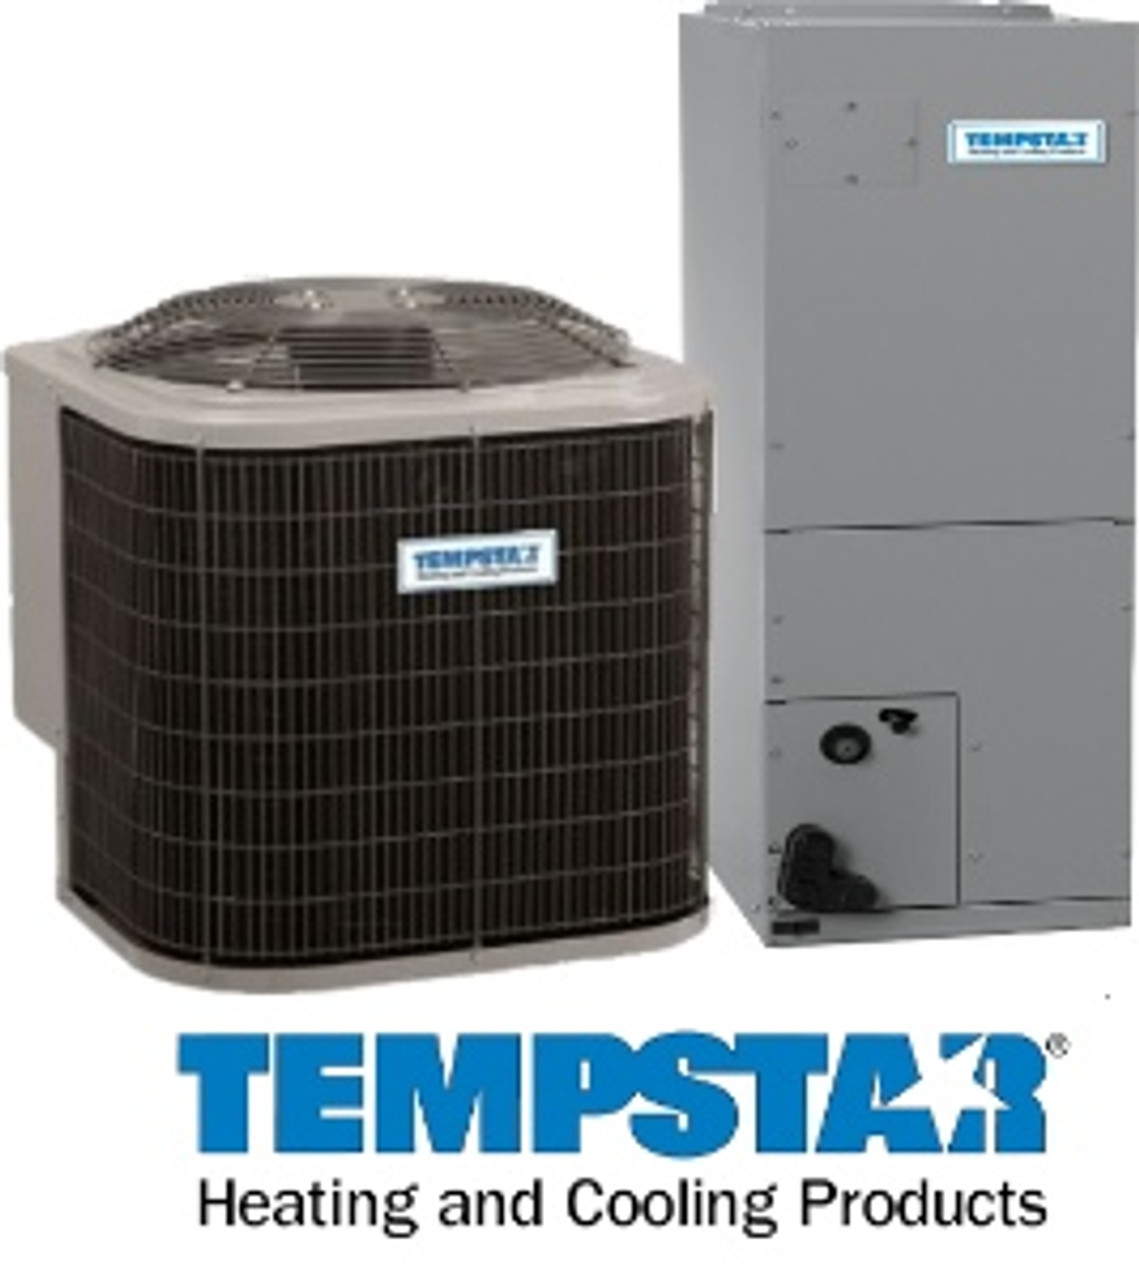 Tempstar 2 5 ton 14 Seer HEAT PUMP-A/C Split System